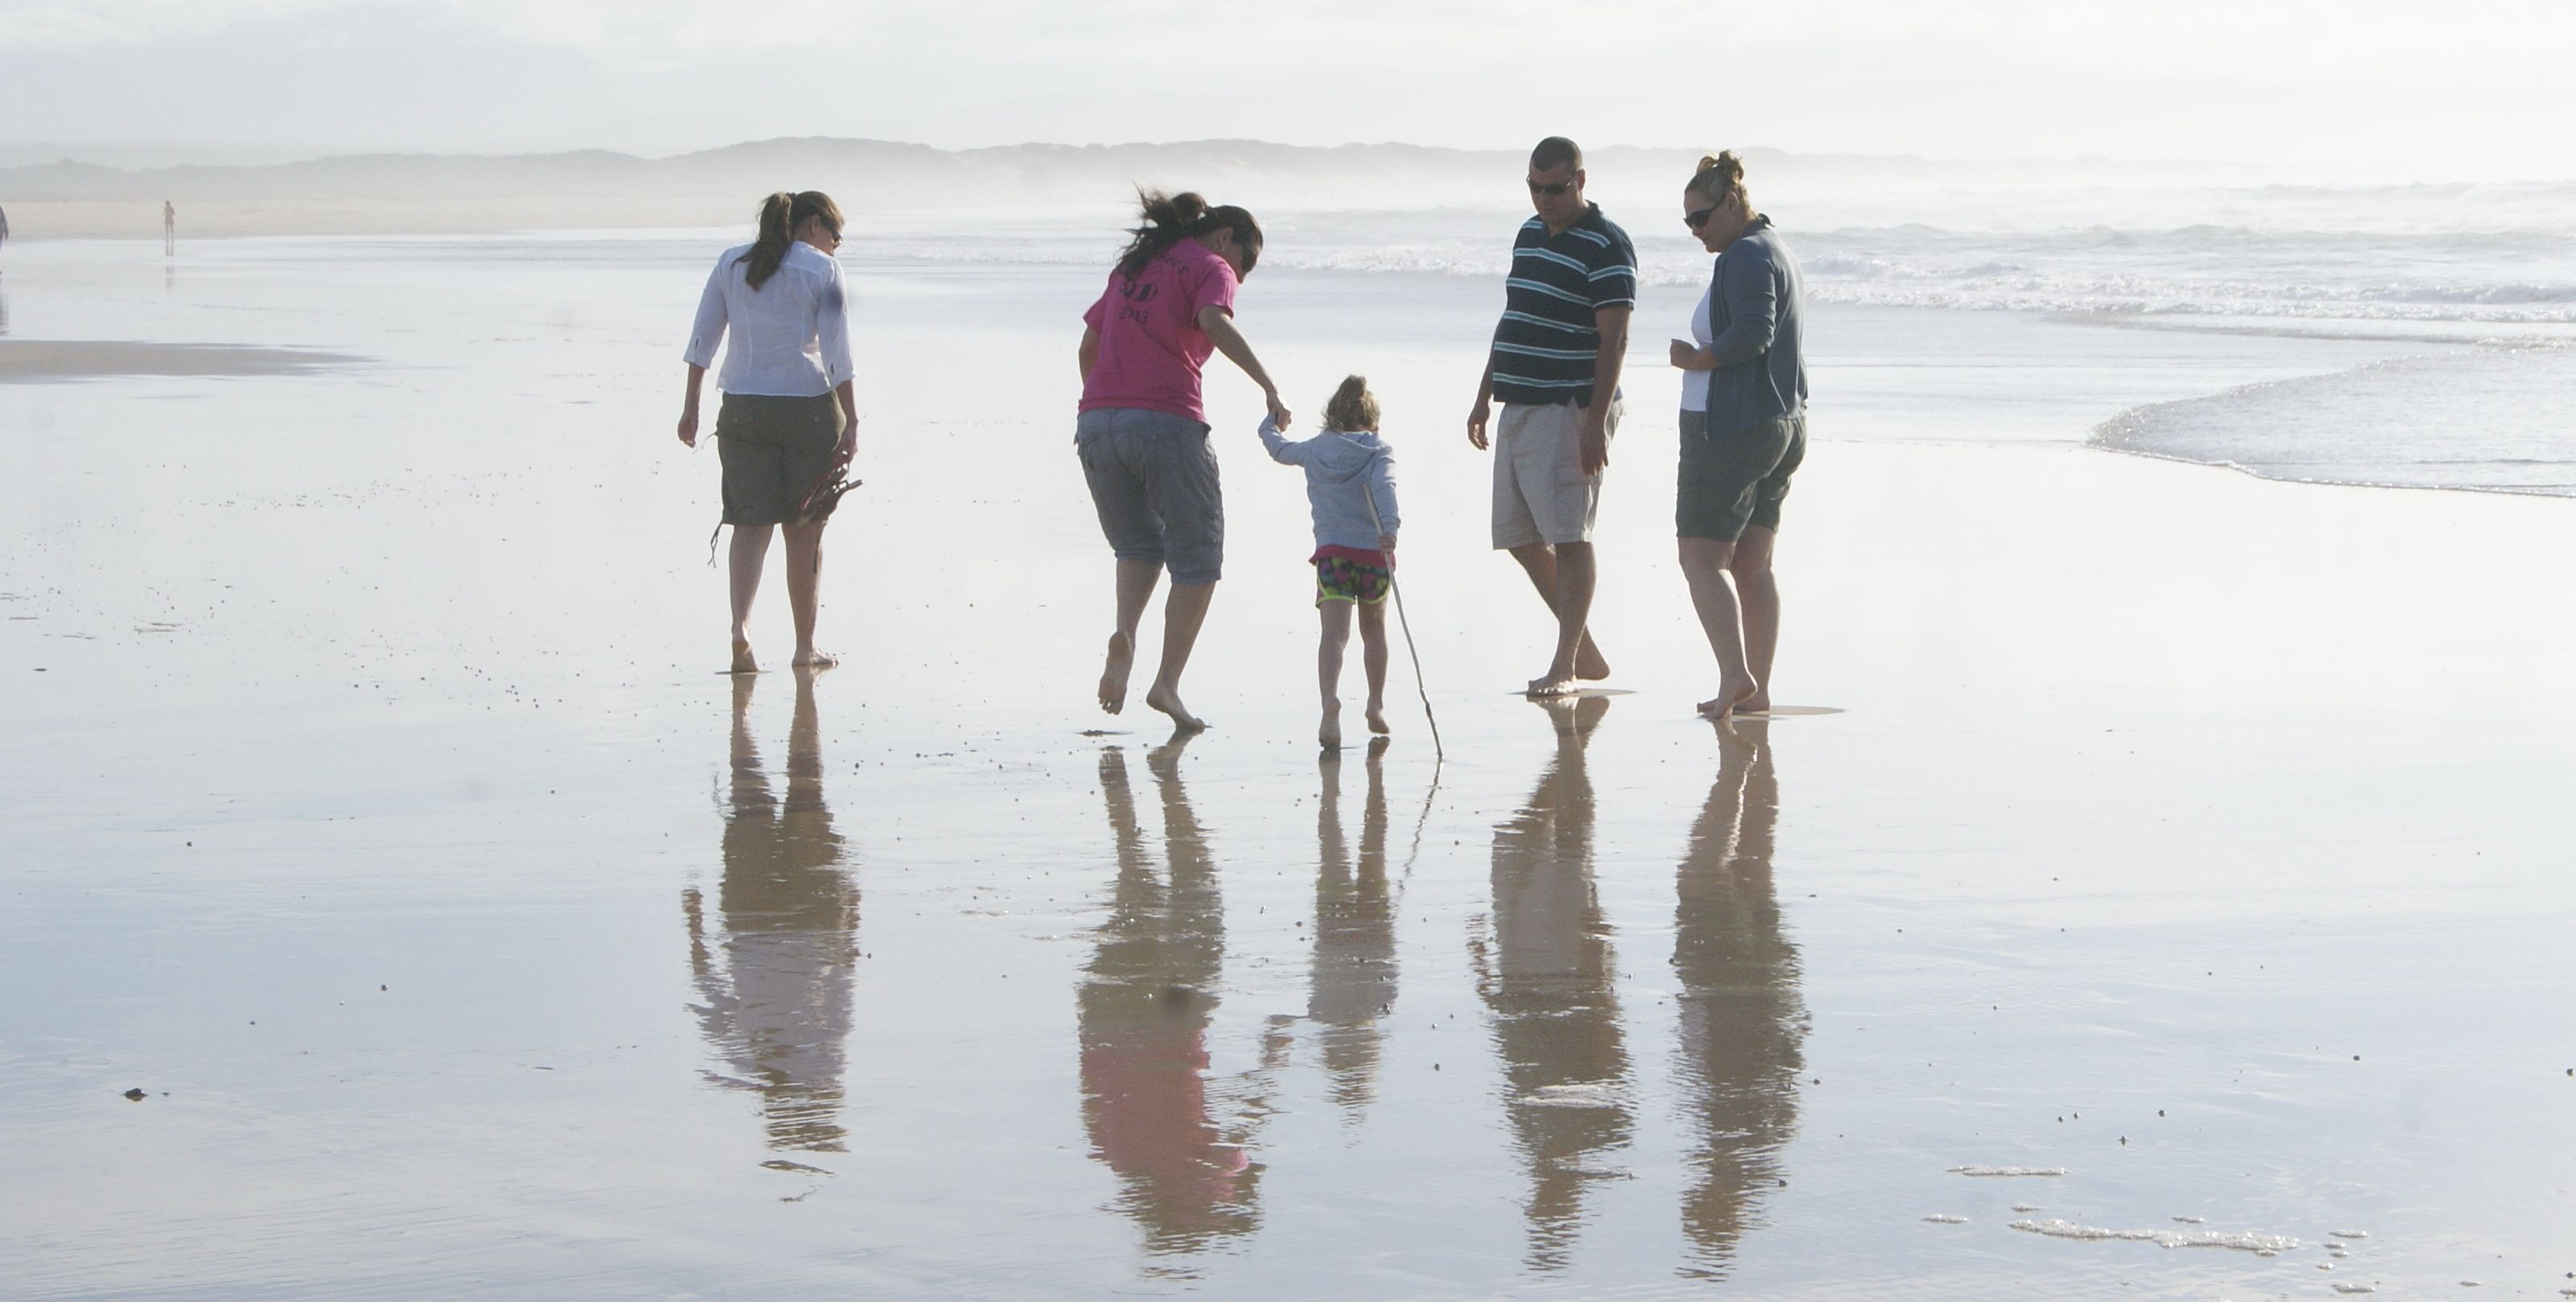 FamilY FuN in JeffreyS BaY